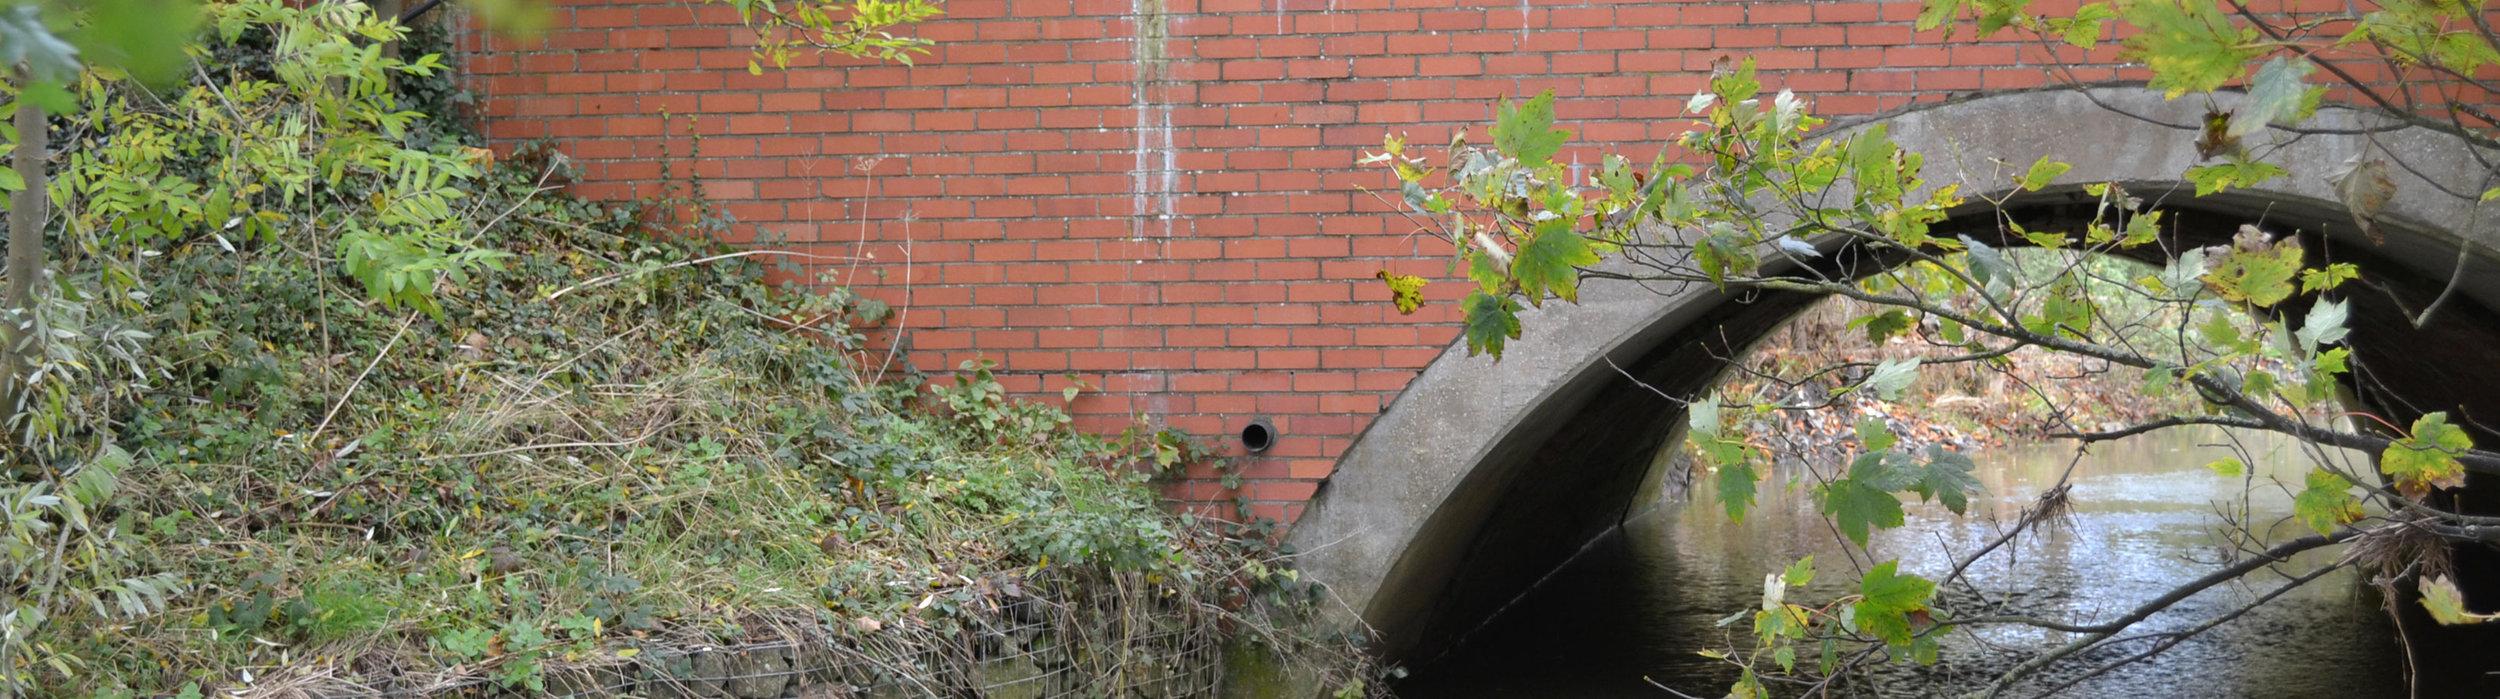 Thorpe_Bridge_panorama.jpg